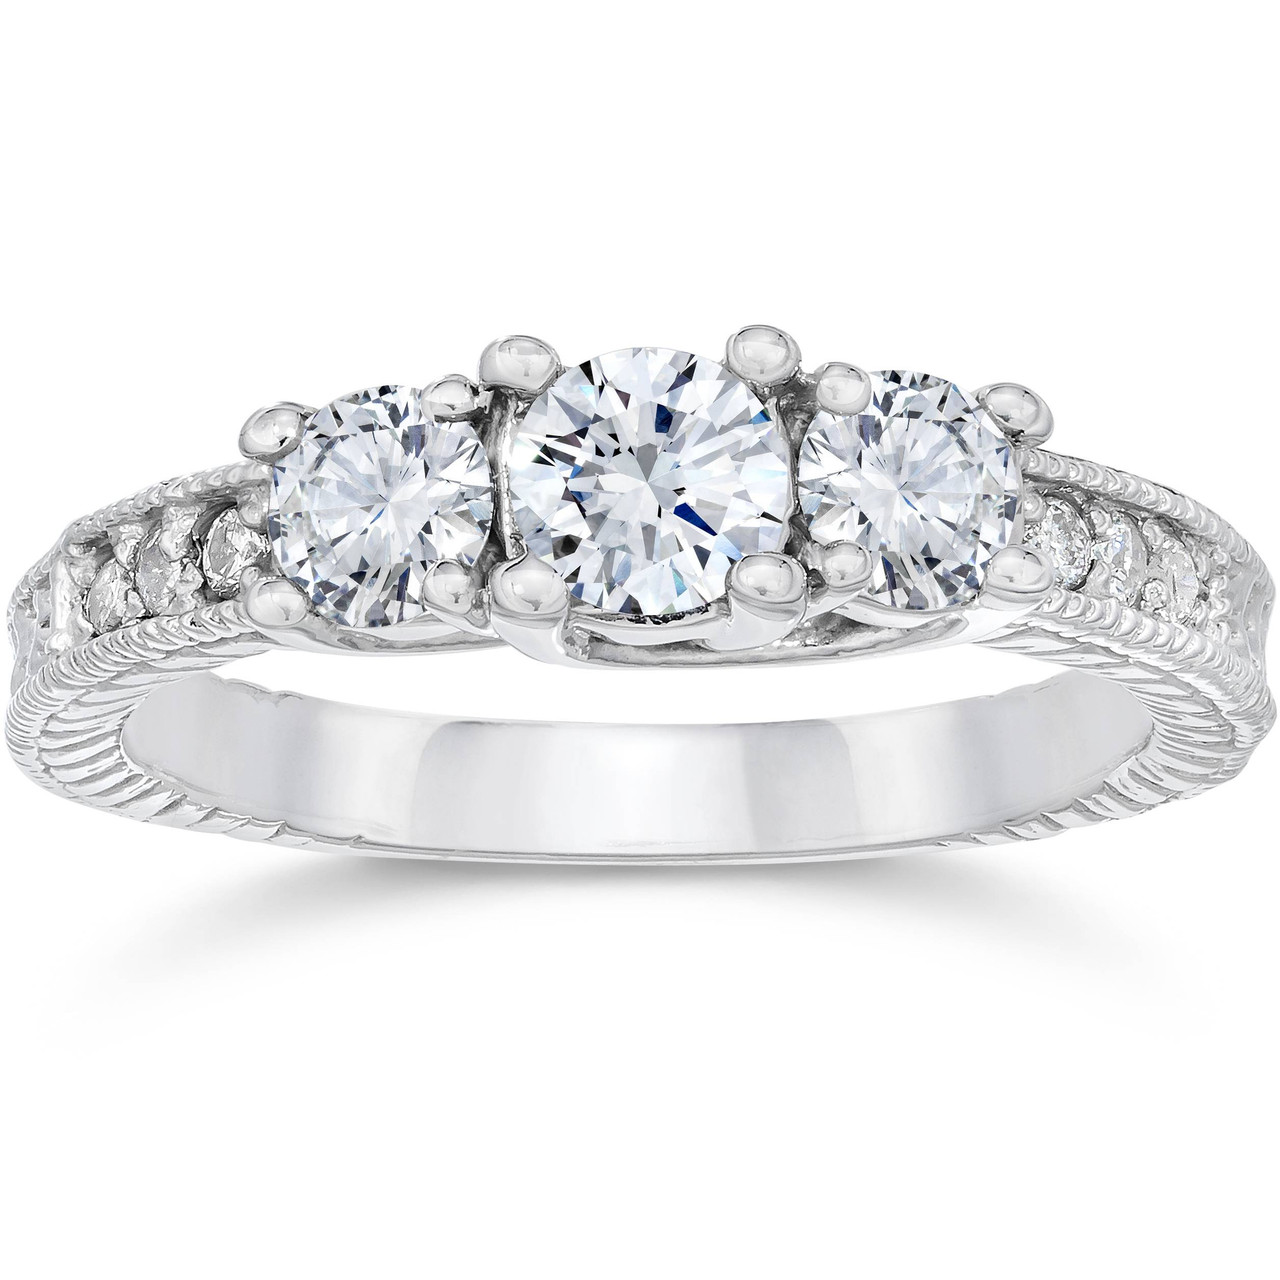 1 Carat Vintage 3Stone Diamond Engagement Anniversary